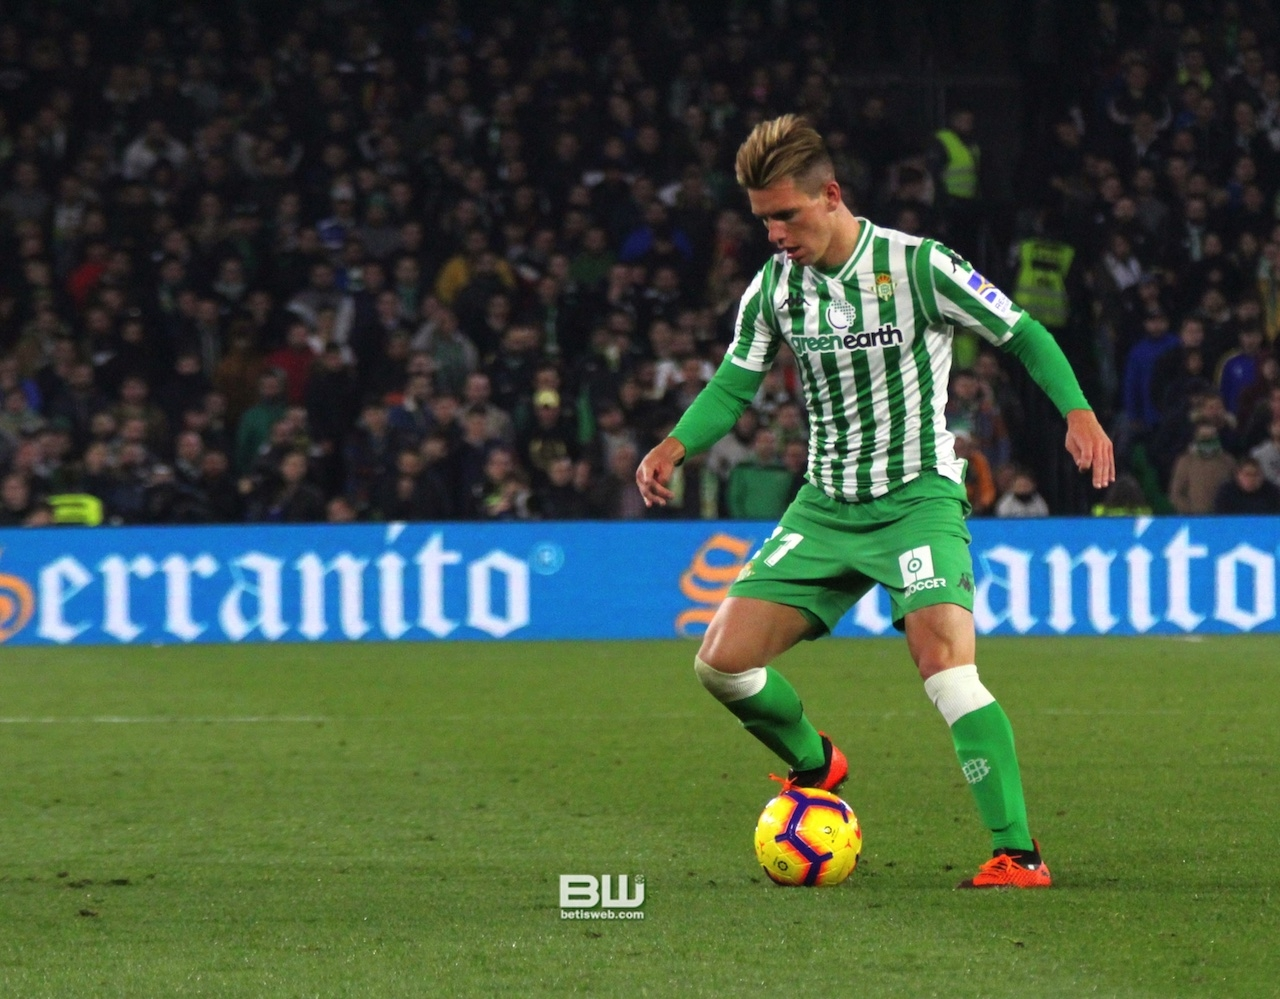 J19 - Betis - Madrid (97)